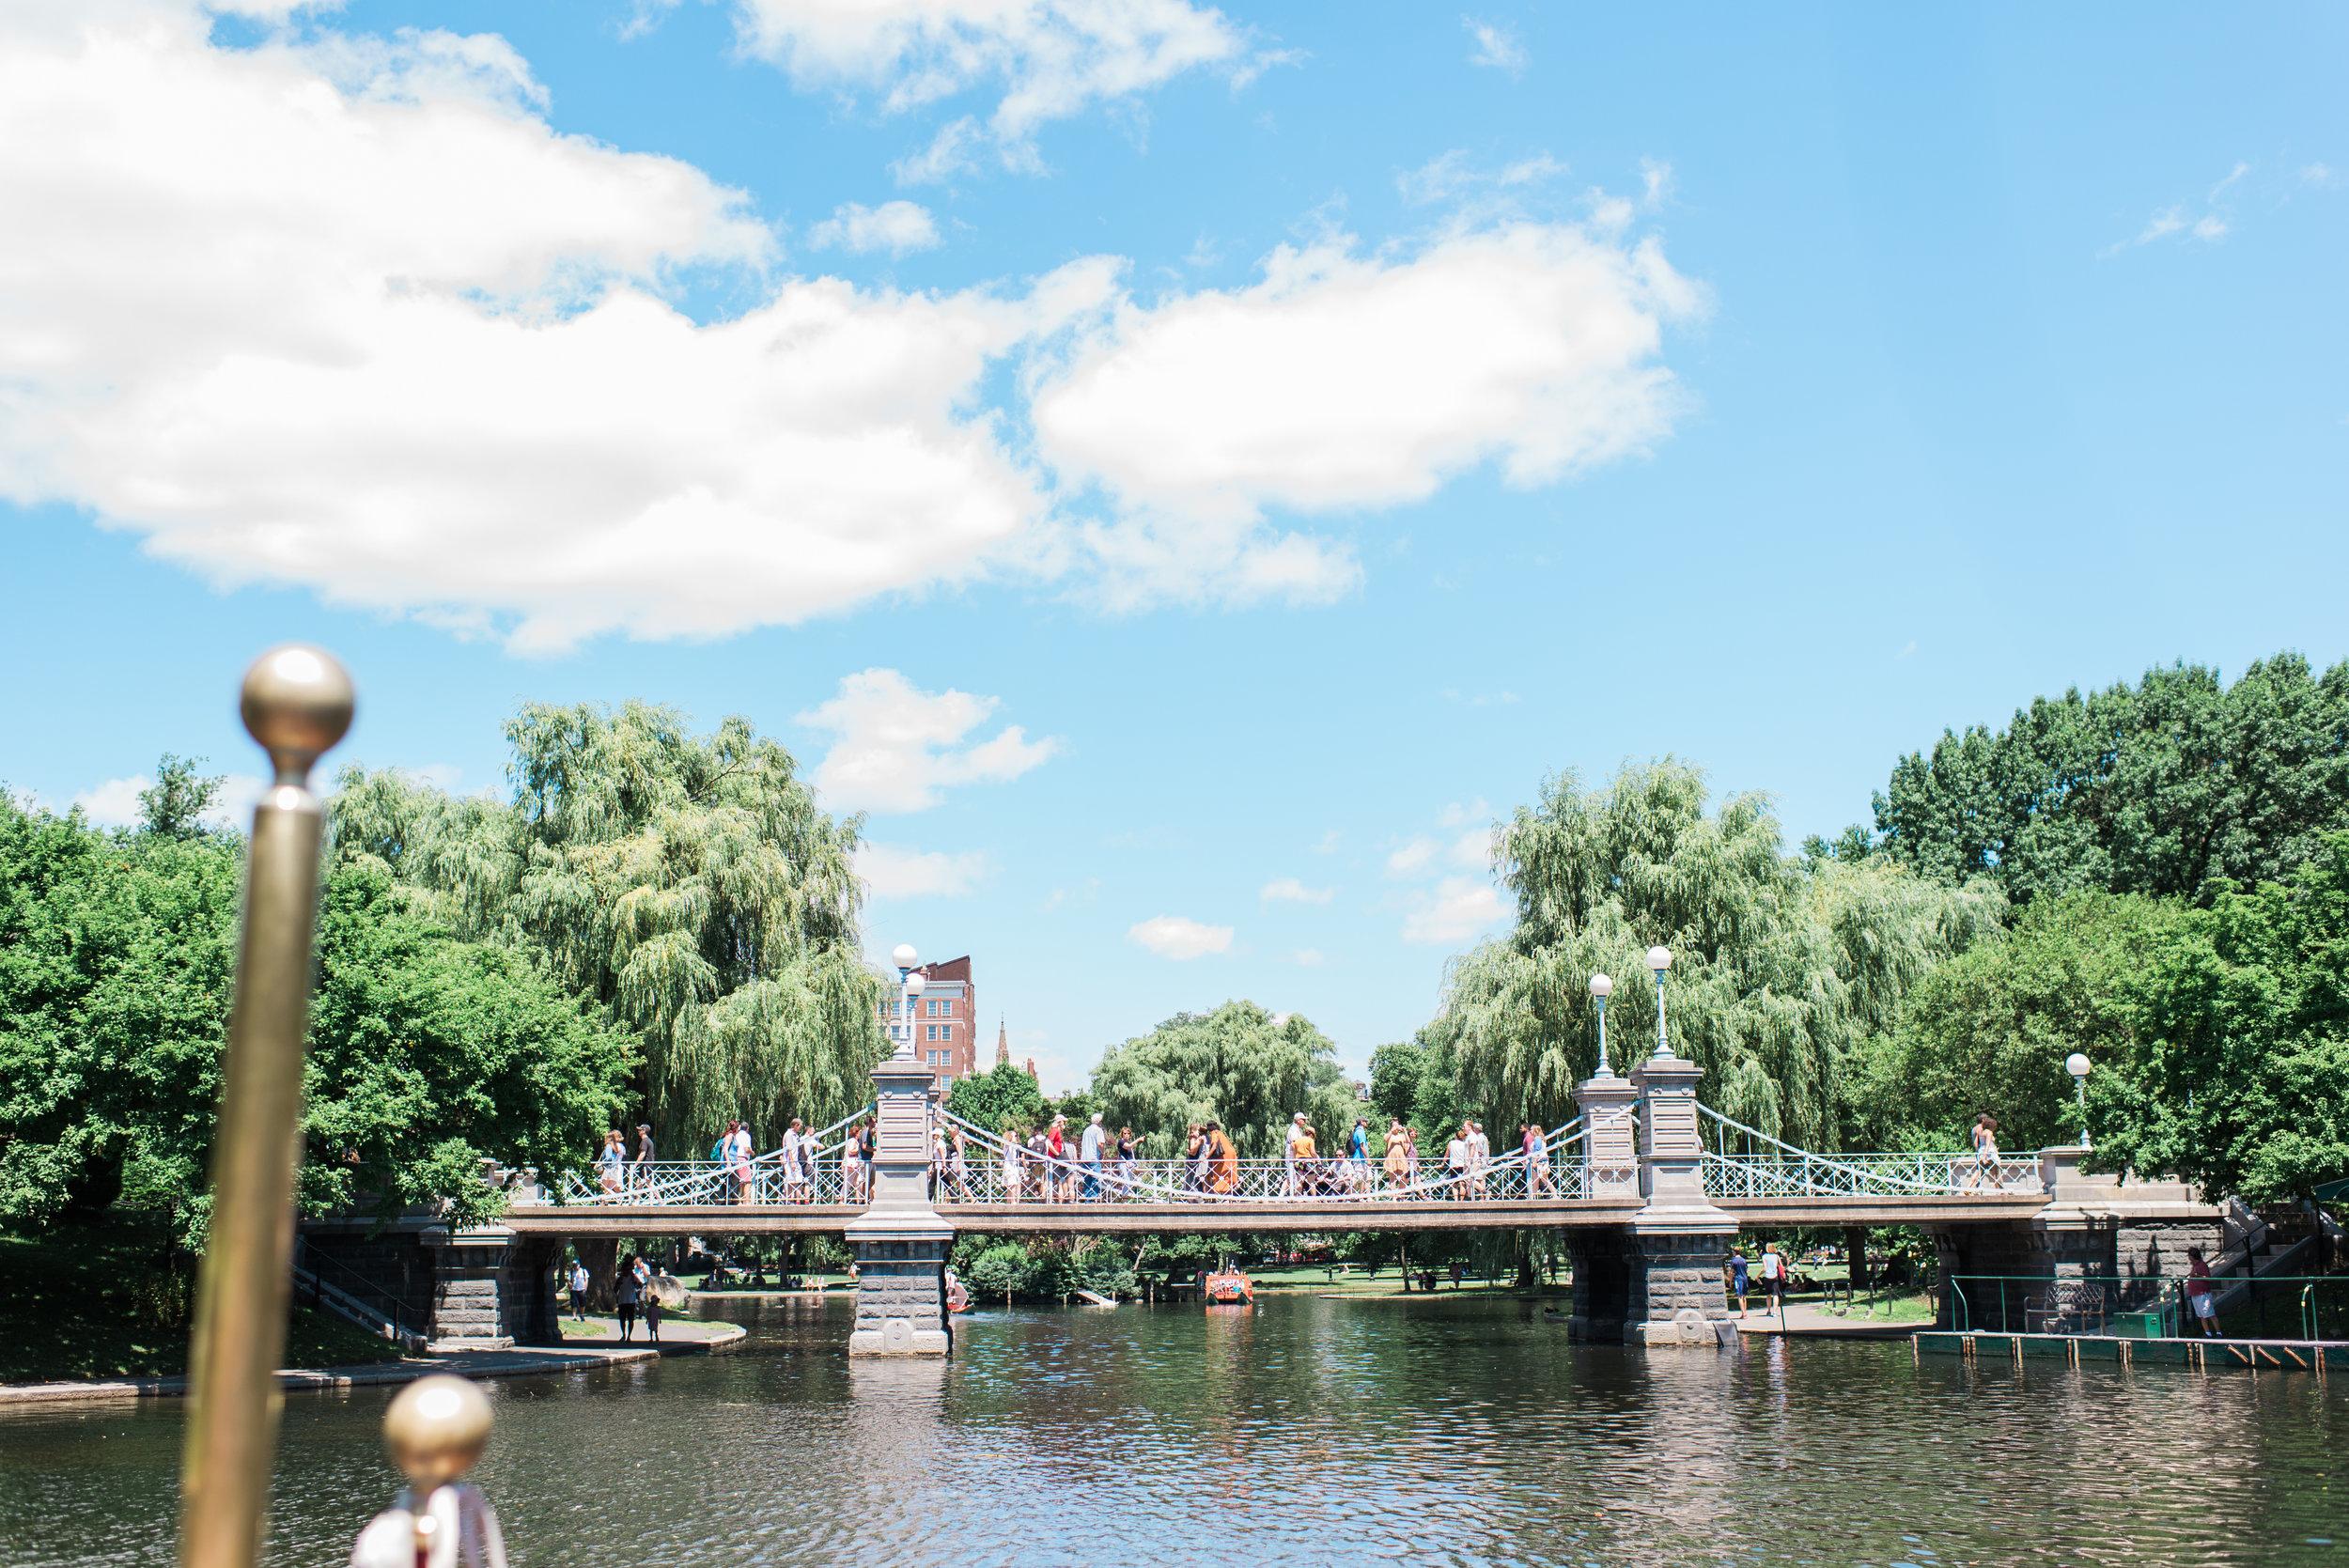 Riding the Swan Boat at the Boston Public Garden